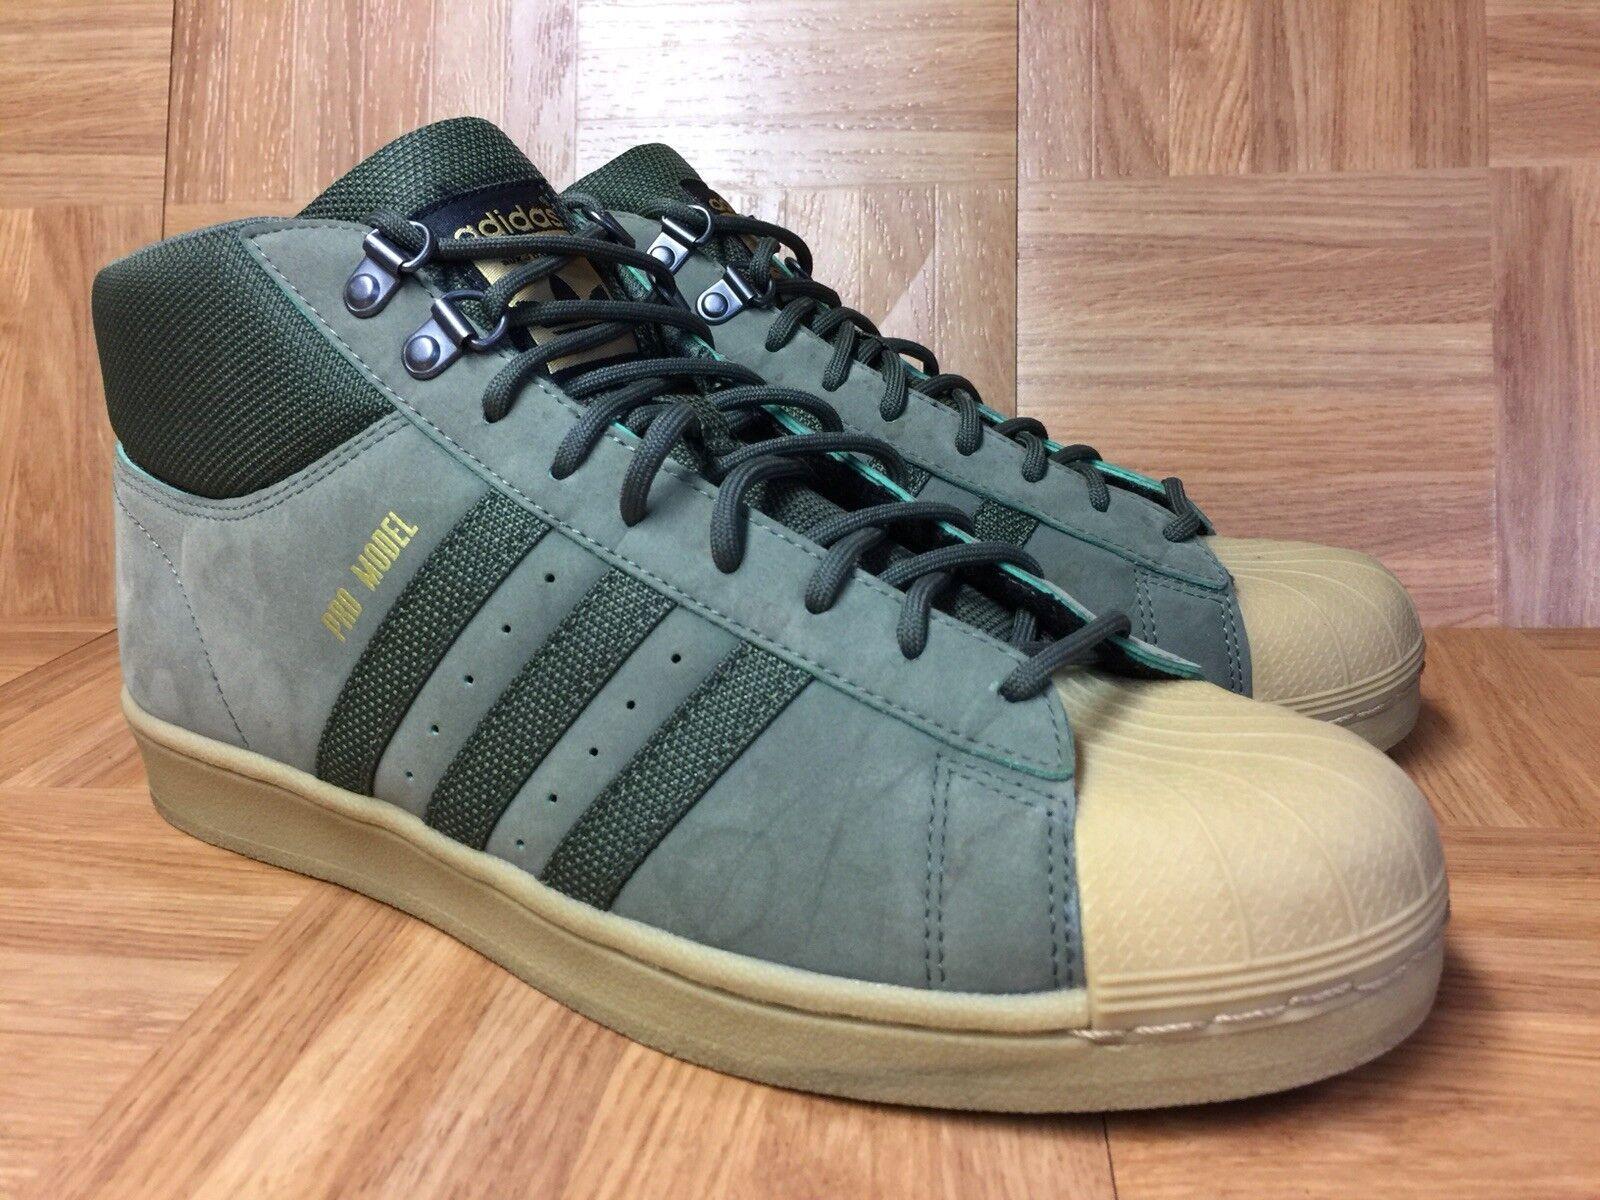 RARE Adidas Originals PRO MODEL Khaki Army Green Base Sz 9 Men's Sneakers LE